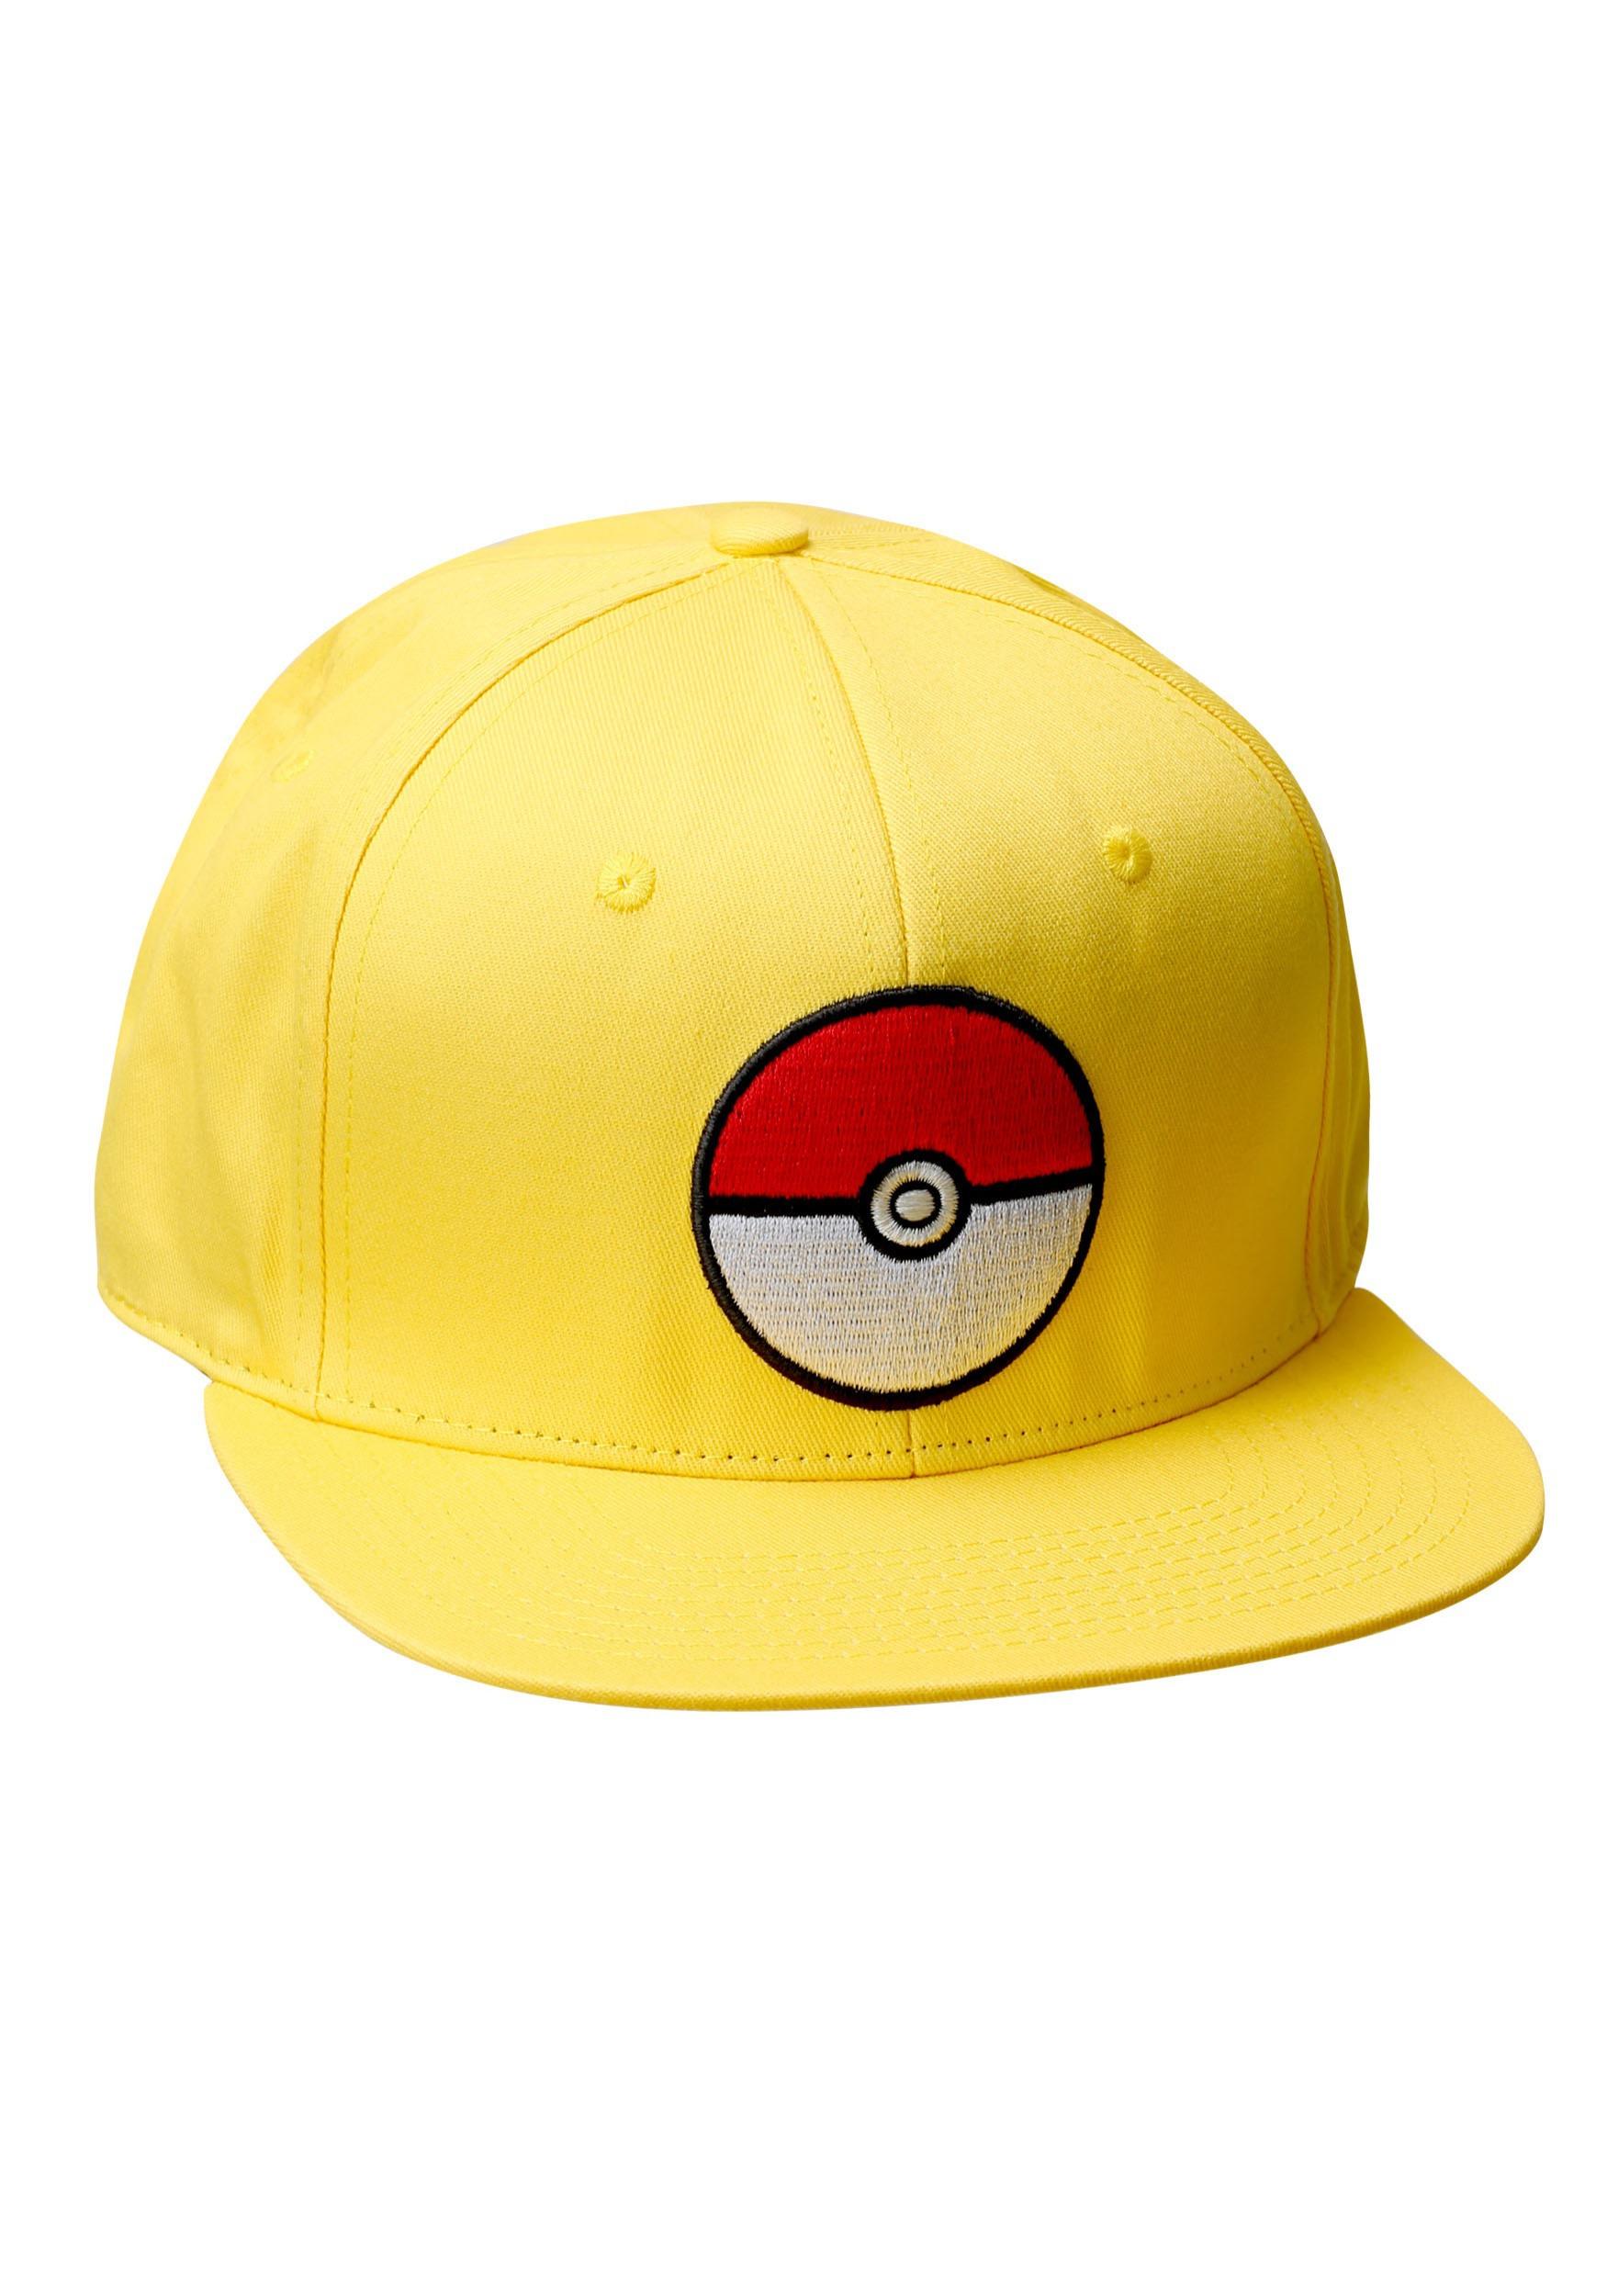 Pokemon Pokeball Trainer Yellow Snapback Hat BWSB4XG1POK00RE00